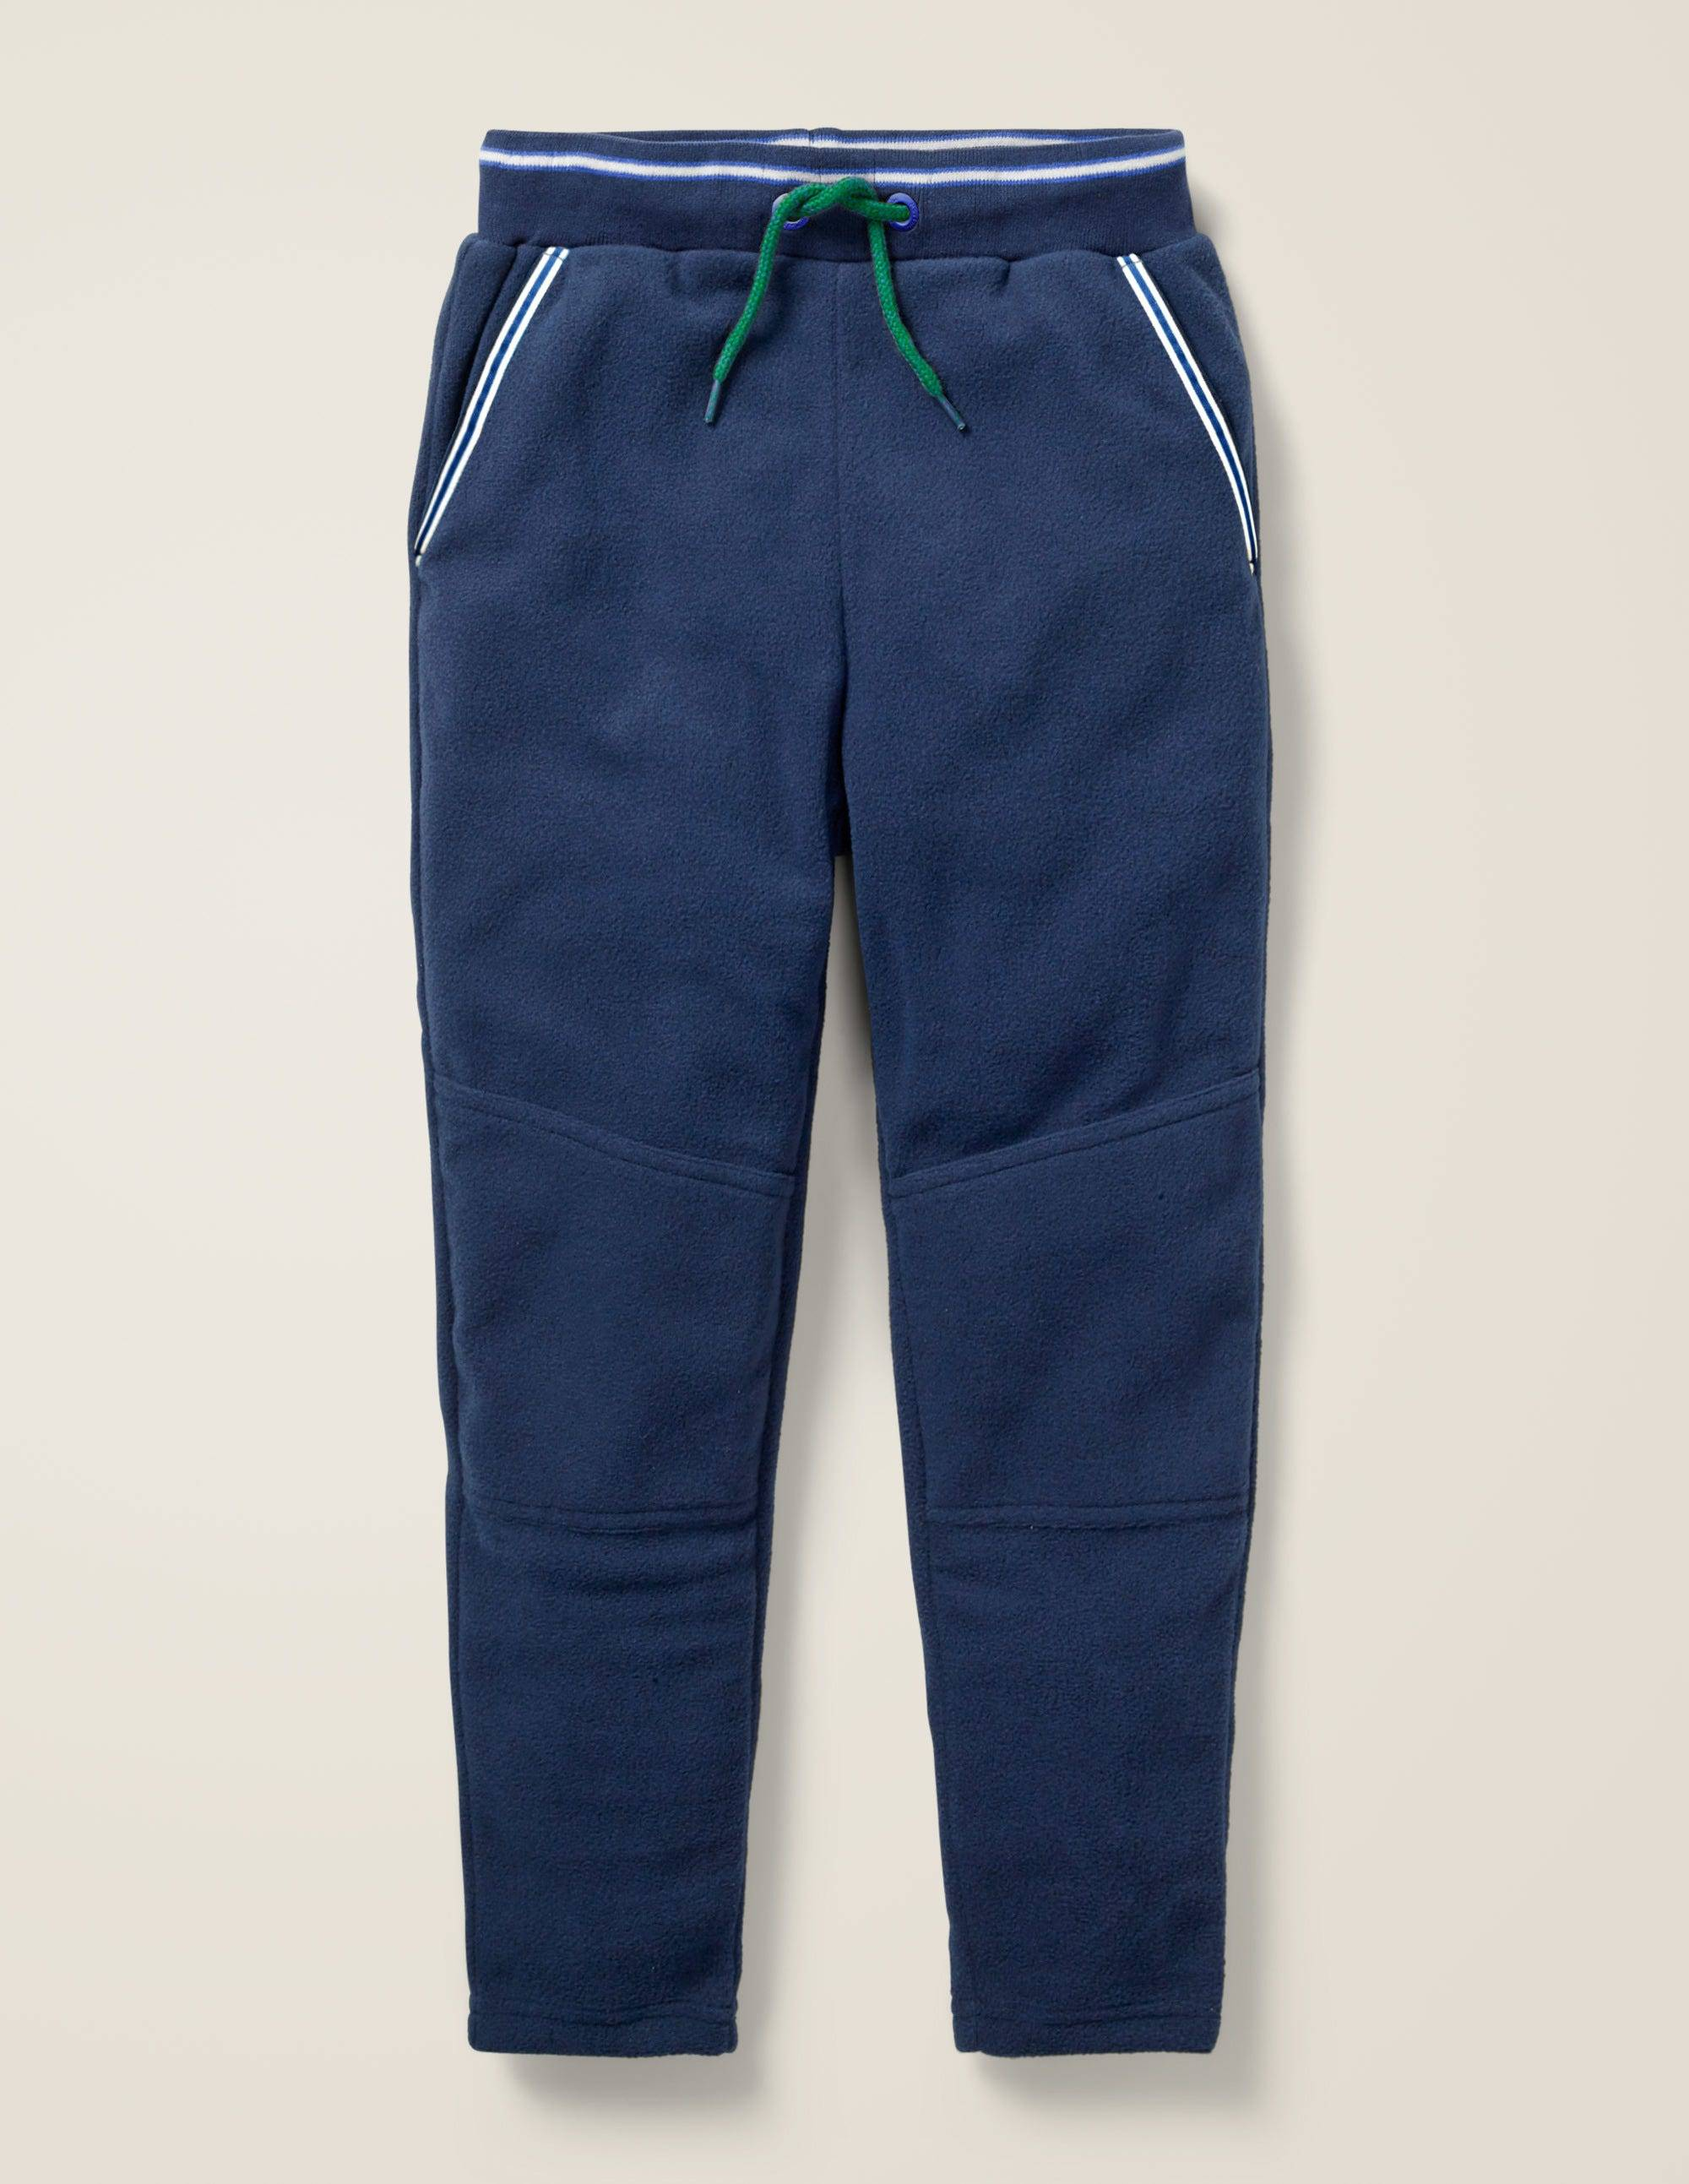 Mini Pantalon de survêtement en micro-polaire BLU Garçon Boden, Blue - 9a